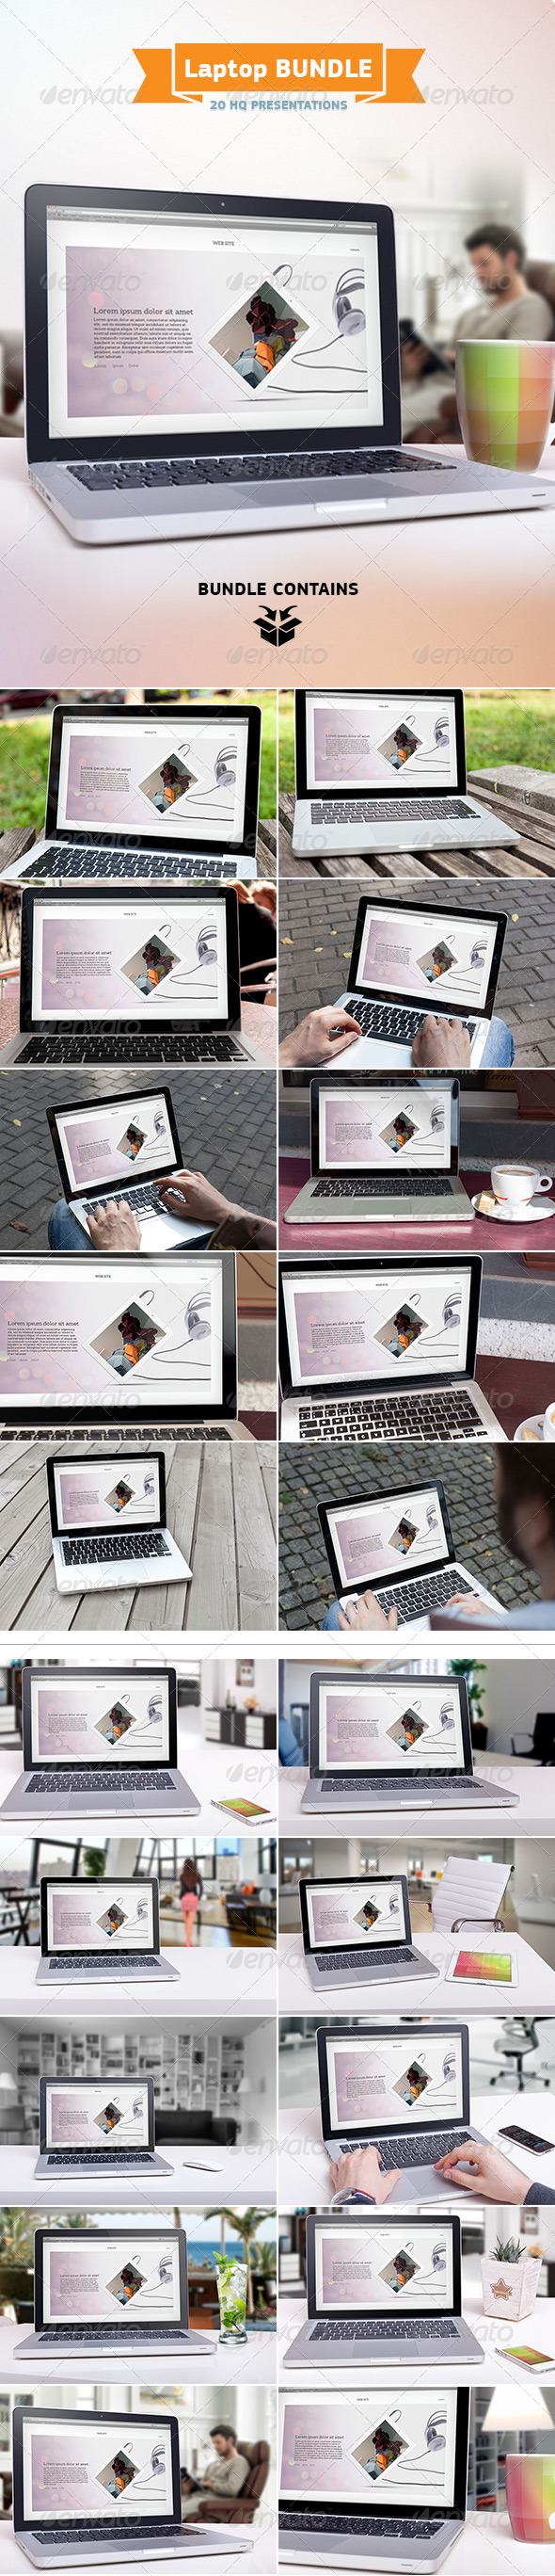 Laptop Screen Mockup Bundle